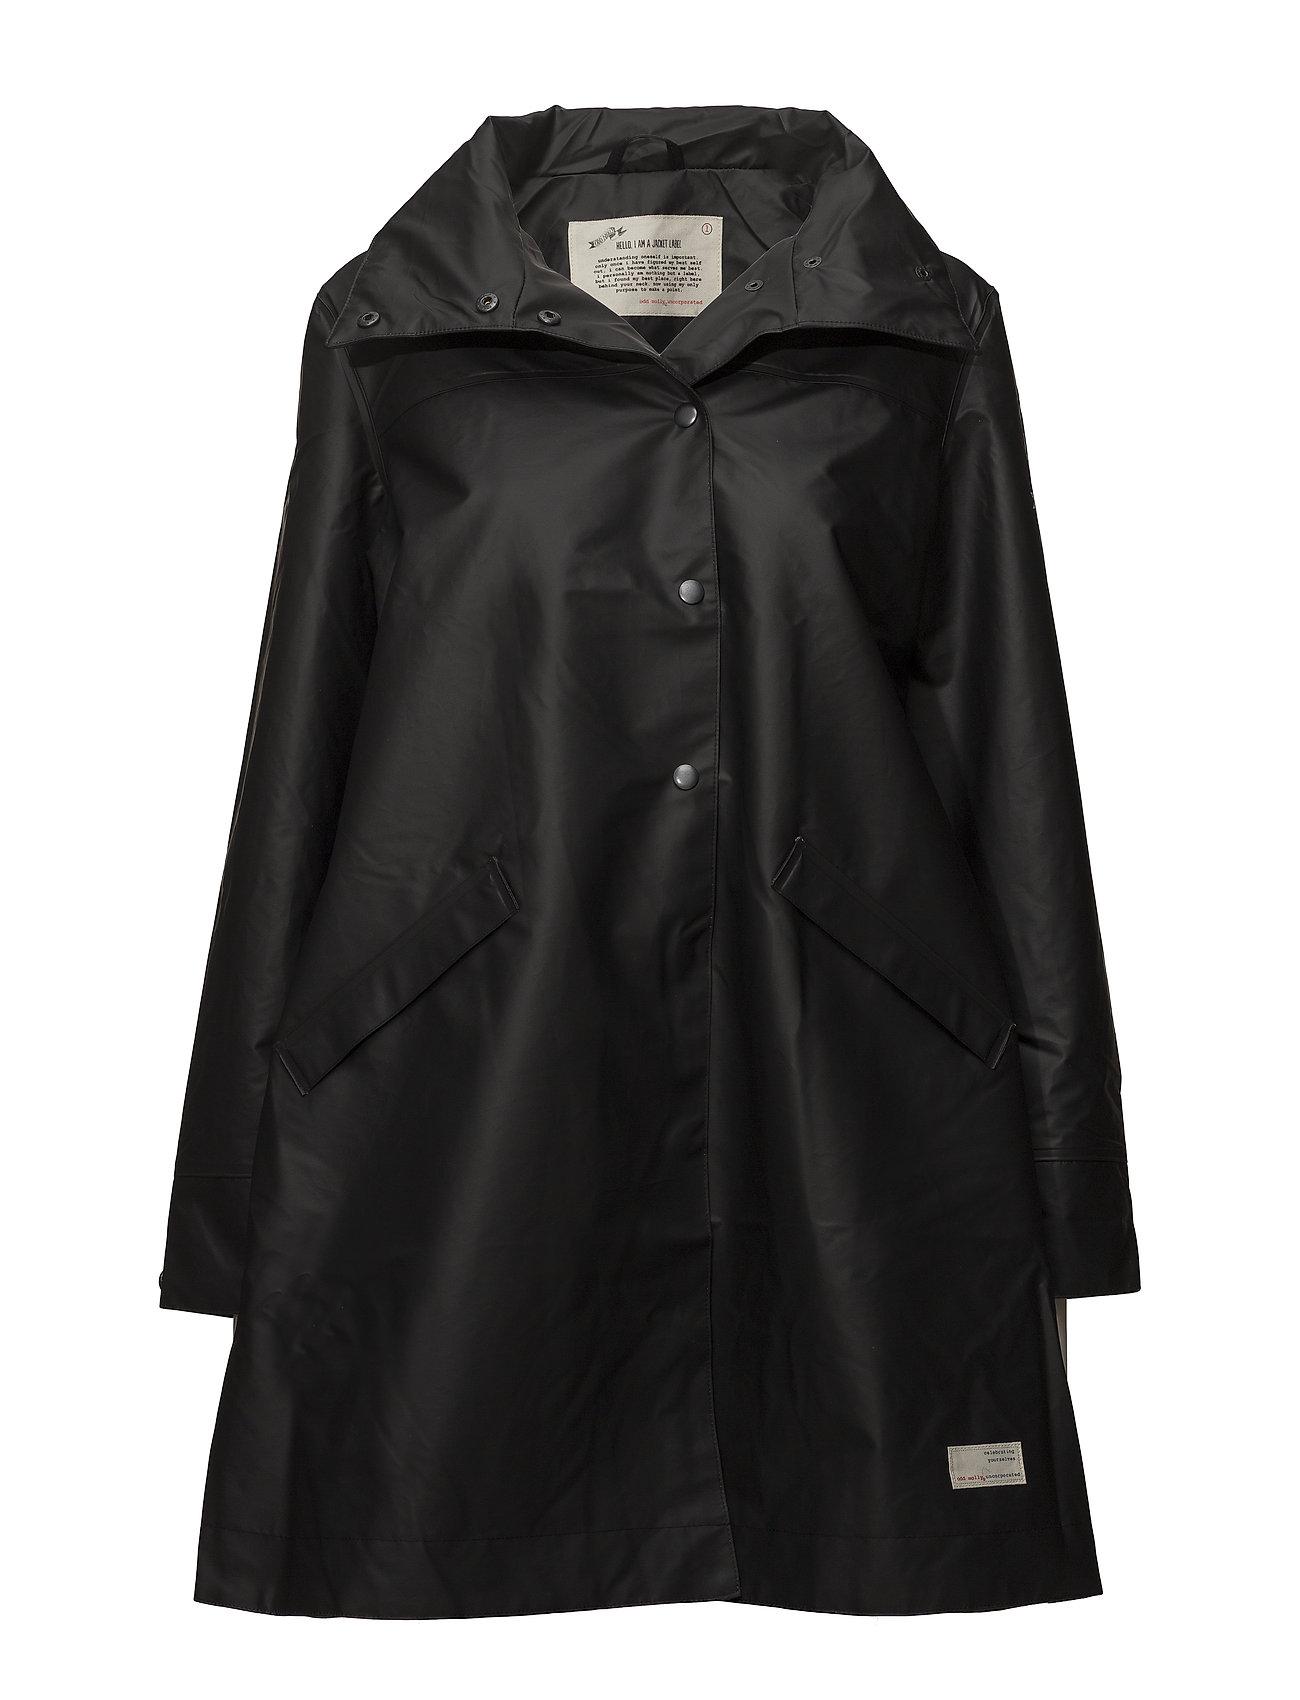 ODD MOLLY outstanding rainjacket